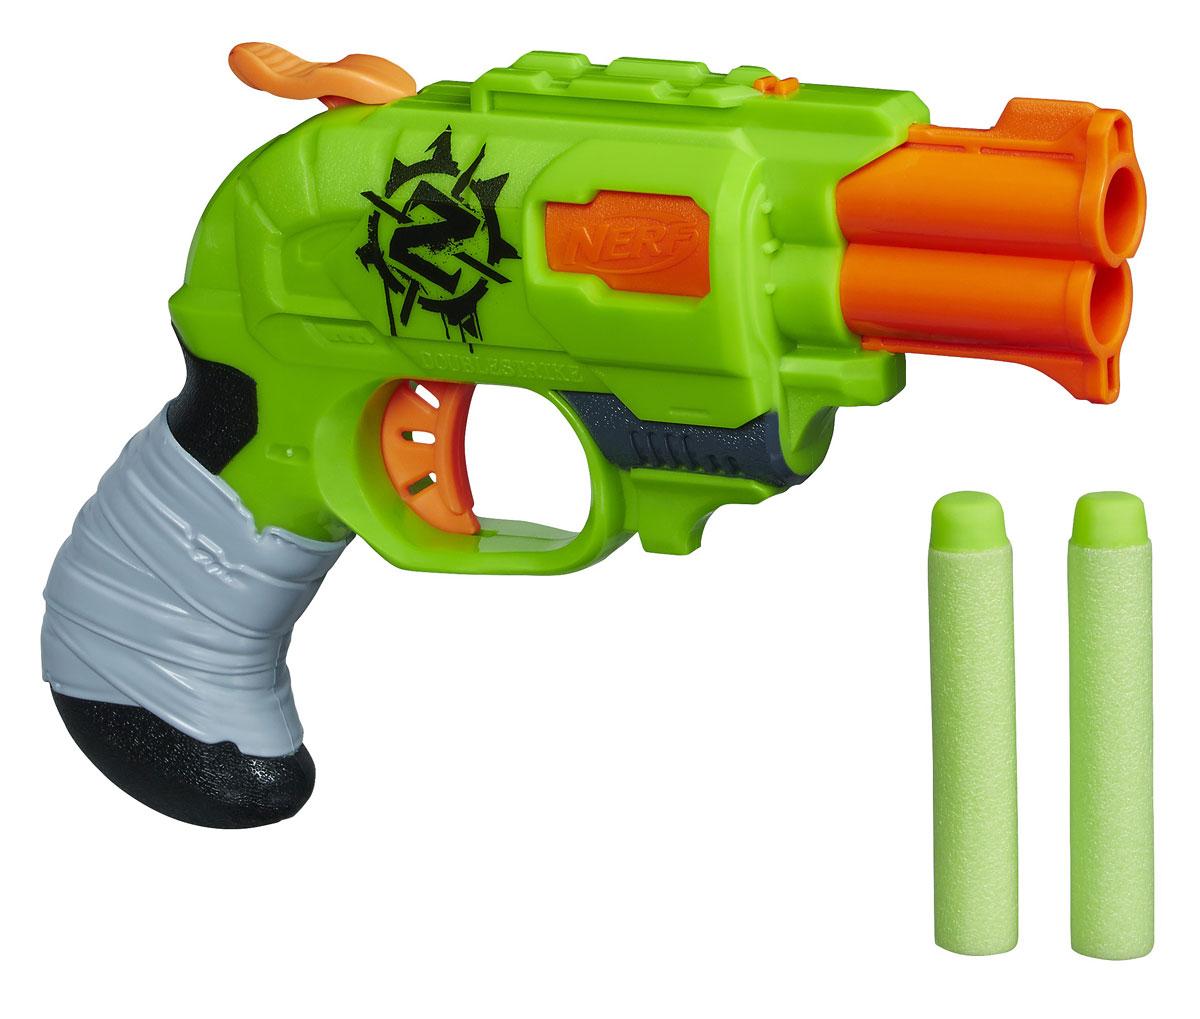 Nerf Бластер Zombie Strike, с патронами, цвет: салатовый, оранжевый nerf бластер zombie strike slingfire с патронами цвет салатовый коричневый оранжевый